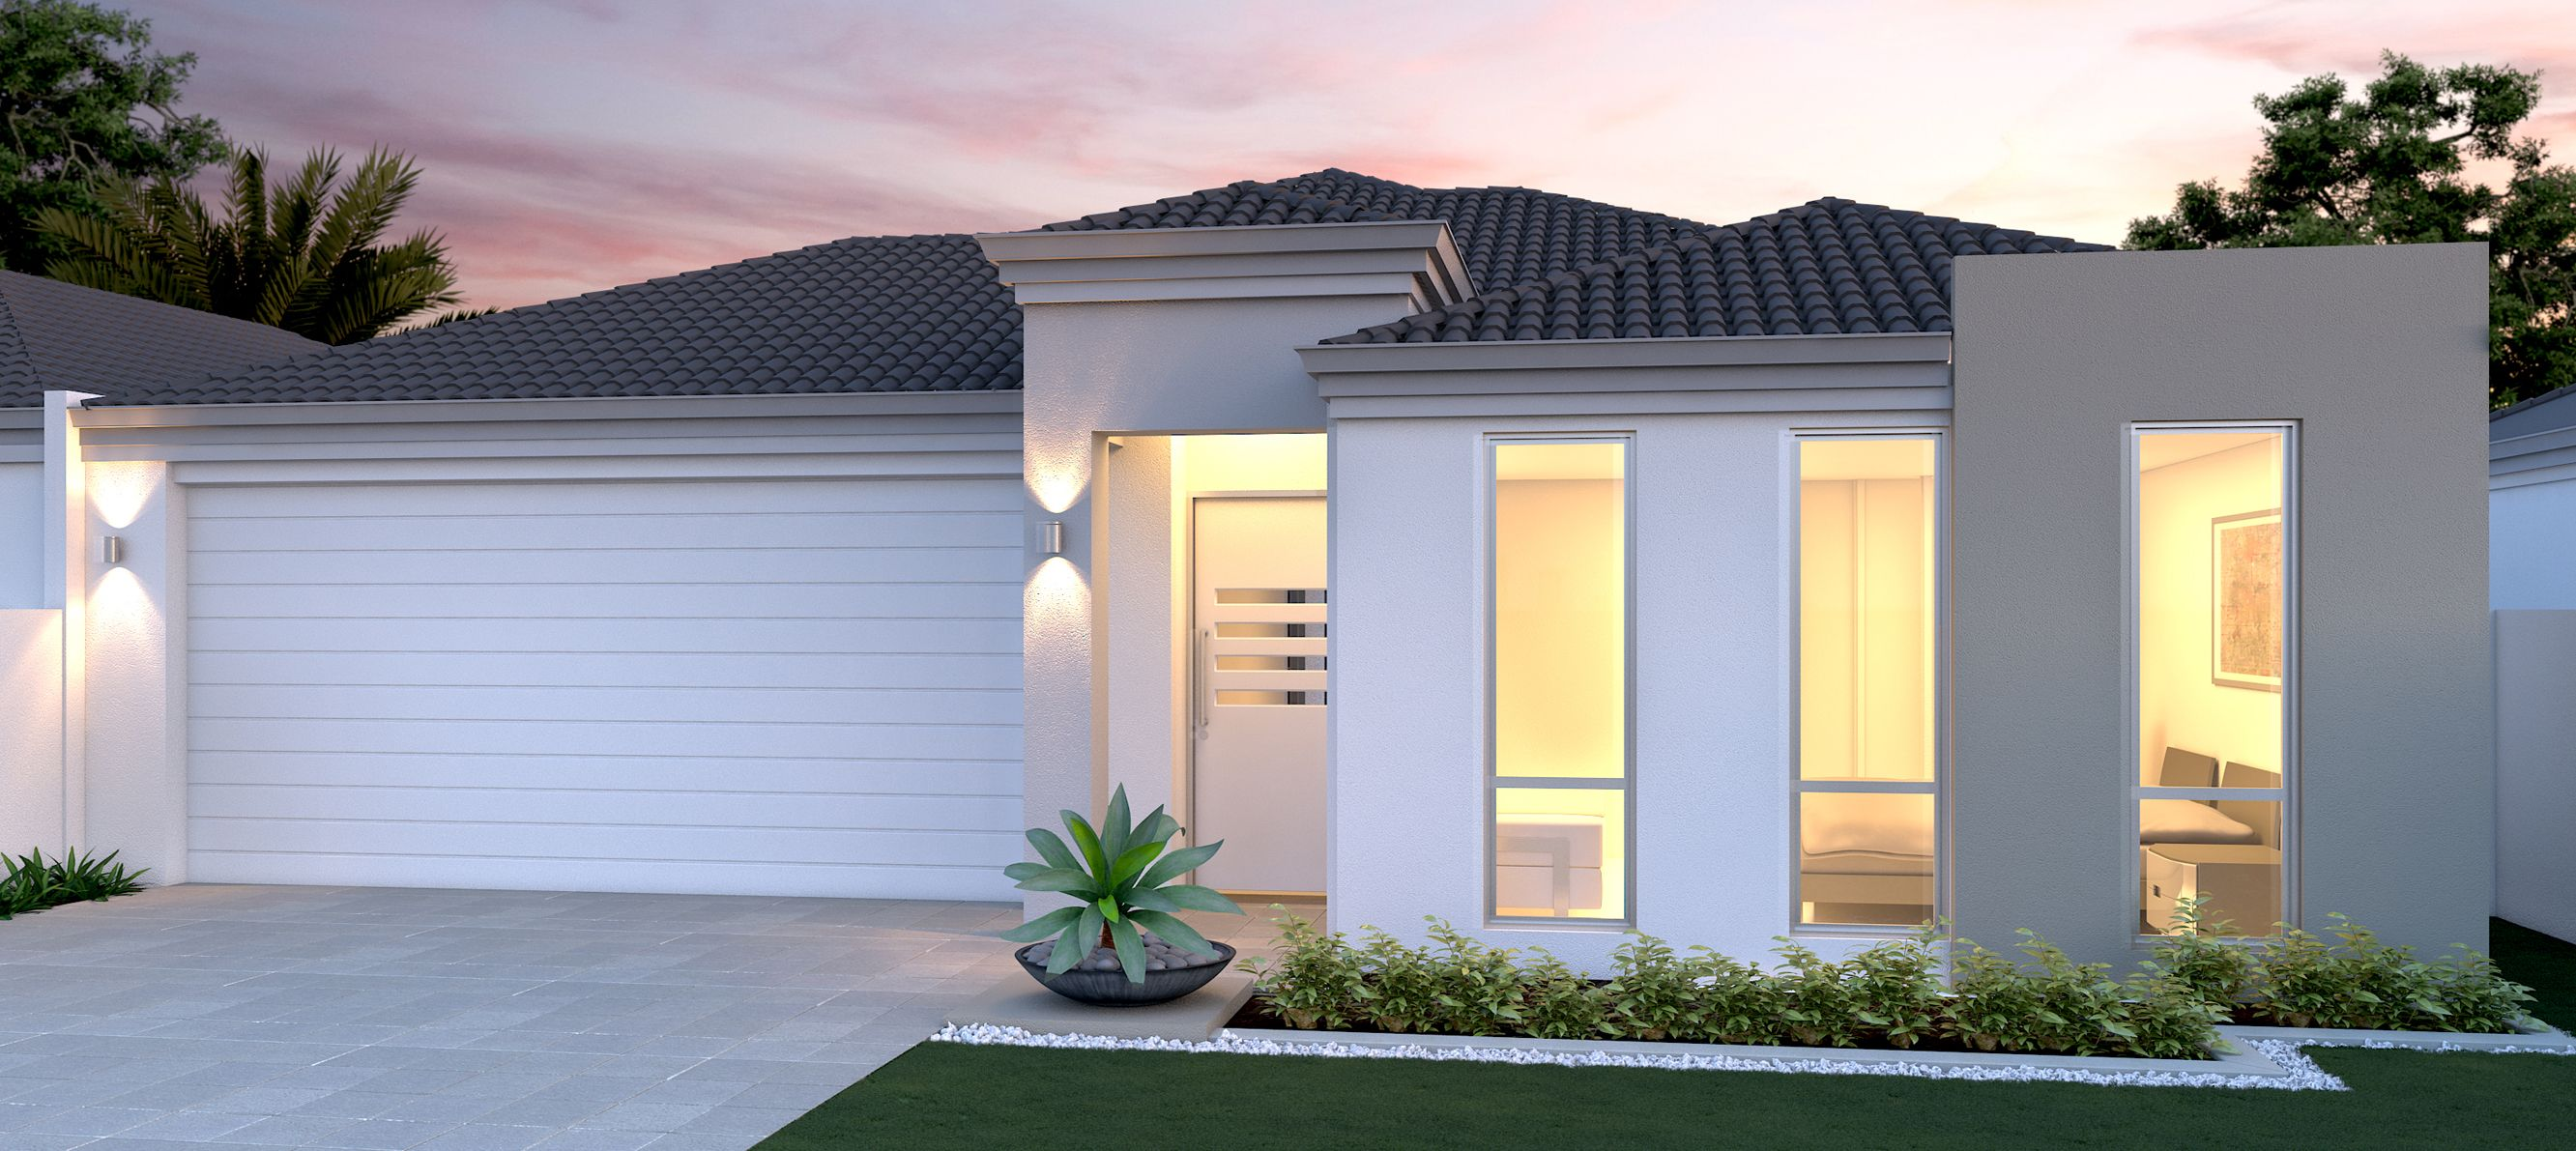 Home ideas minimalist contemporary white gray house design facade